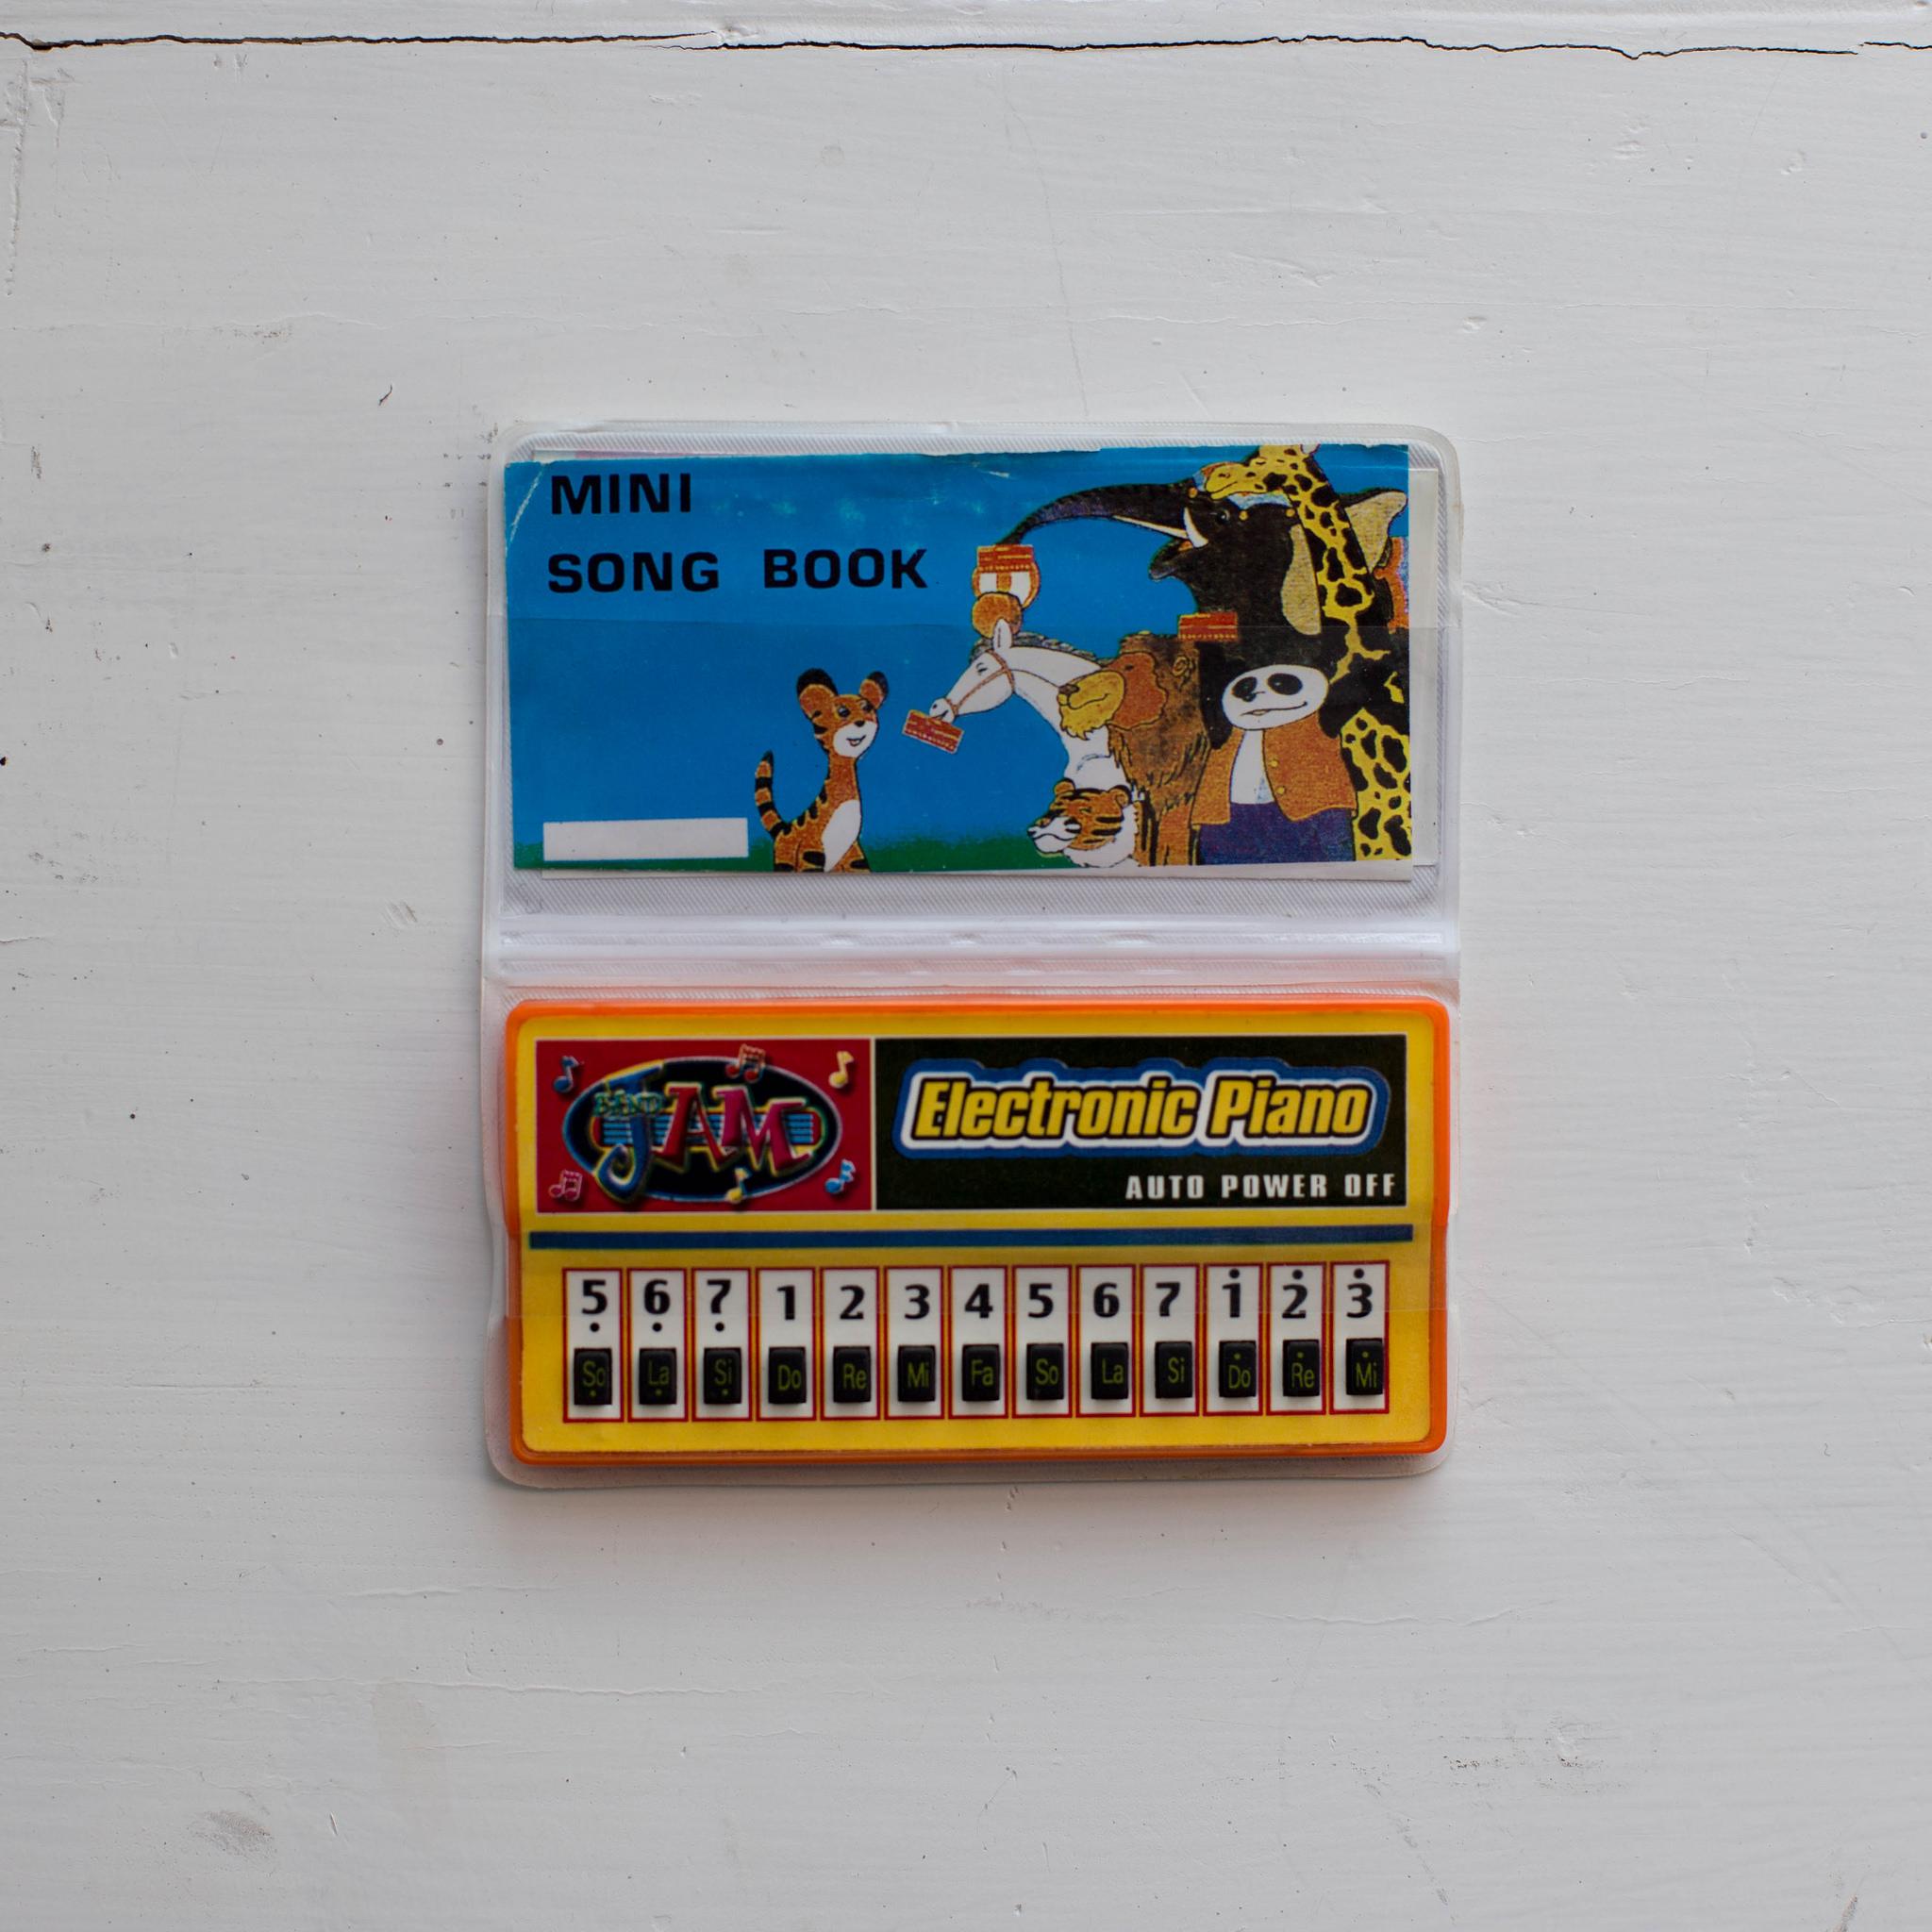 Electron ECHO Mini Piano (Kontakt, Ableton Live, SFZ